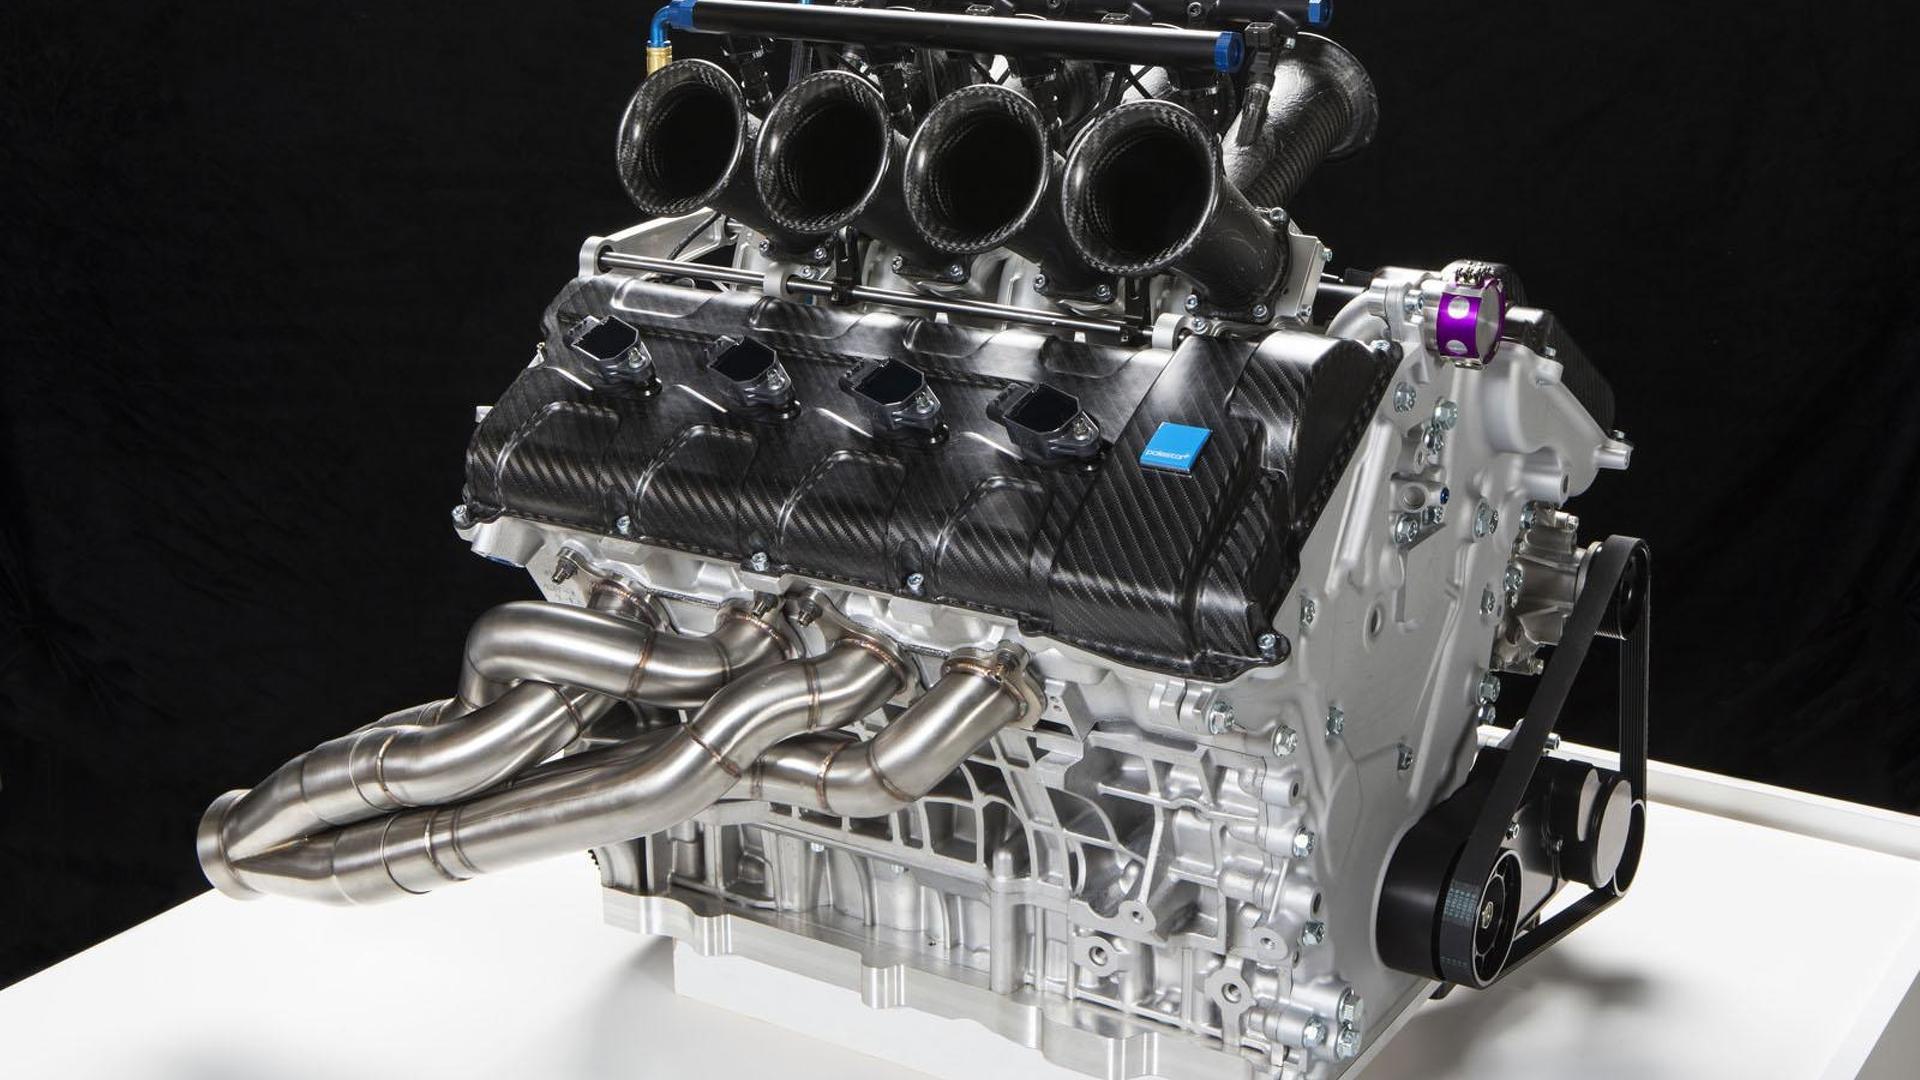 Volvo supercar engine